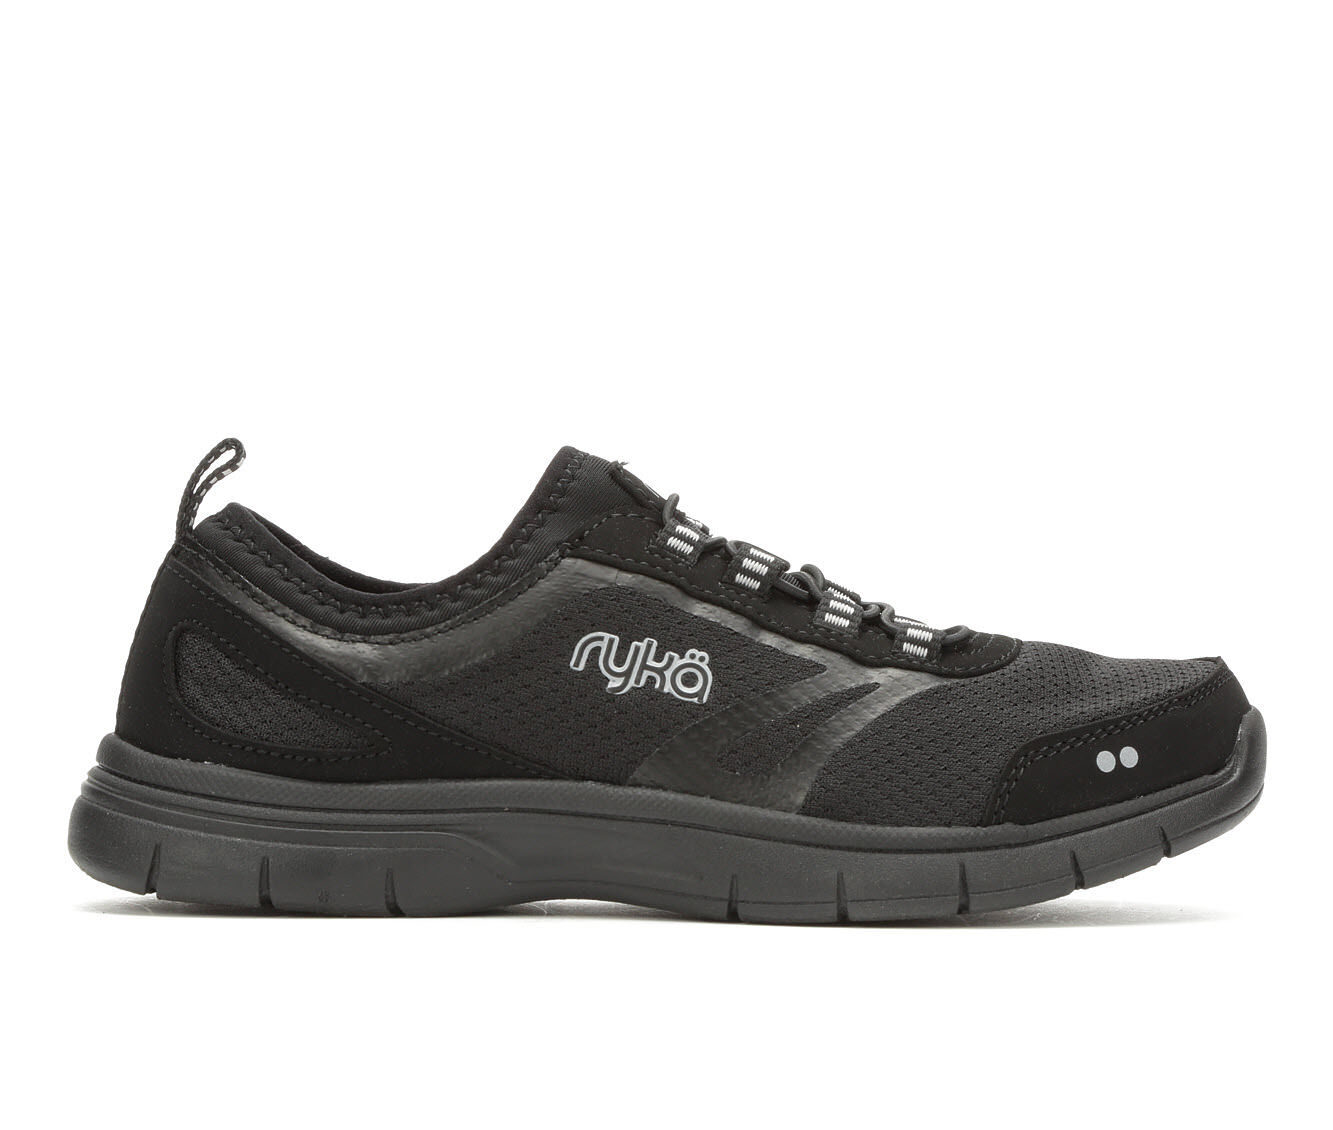 Women's Ryka Divya Training Shoes Black/Black